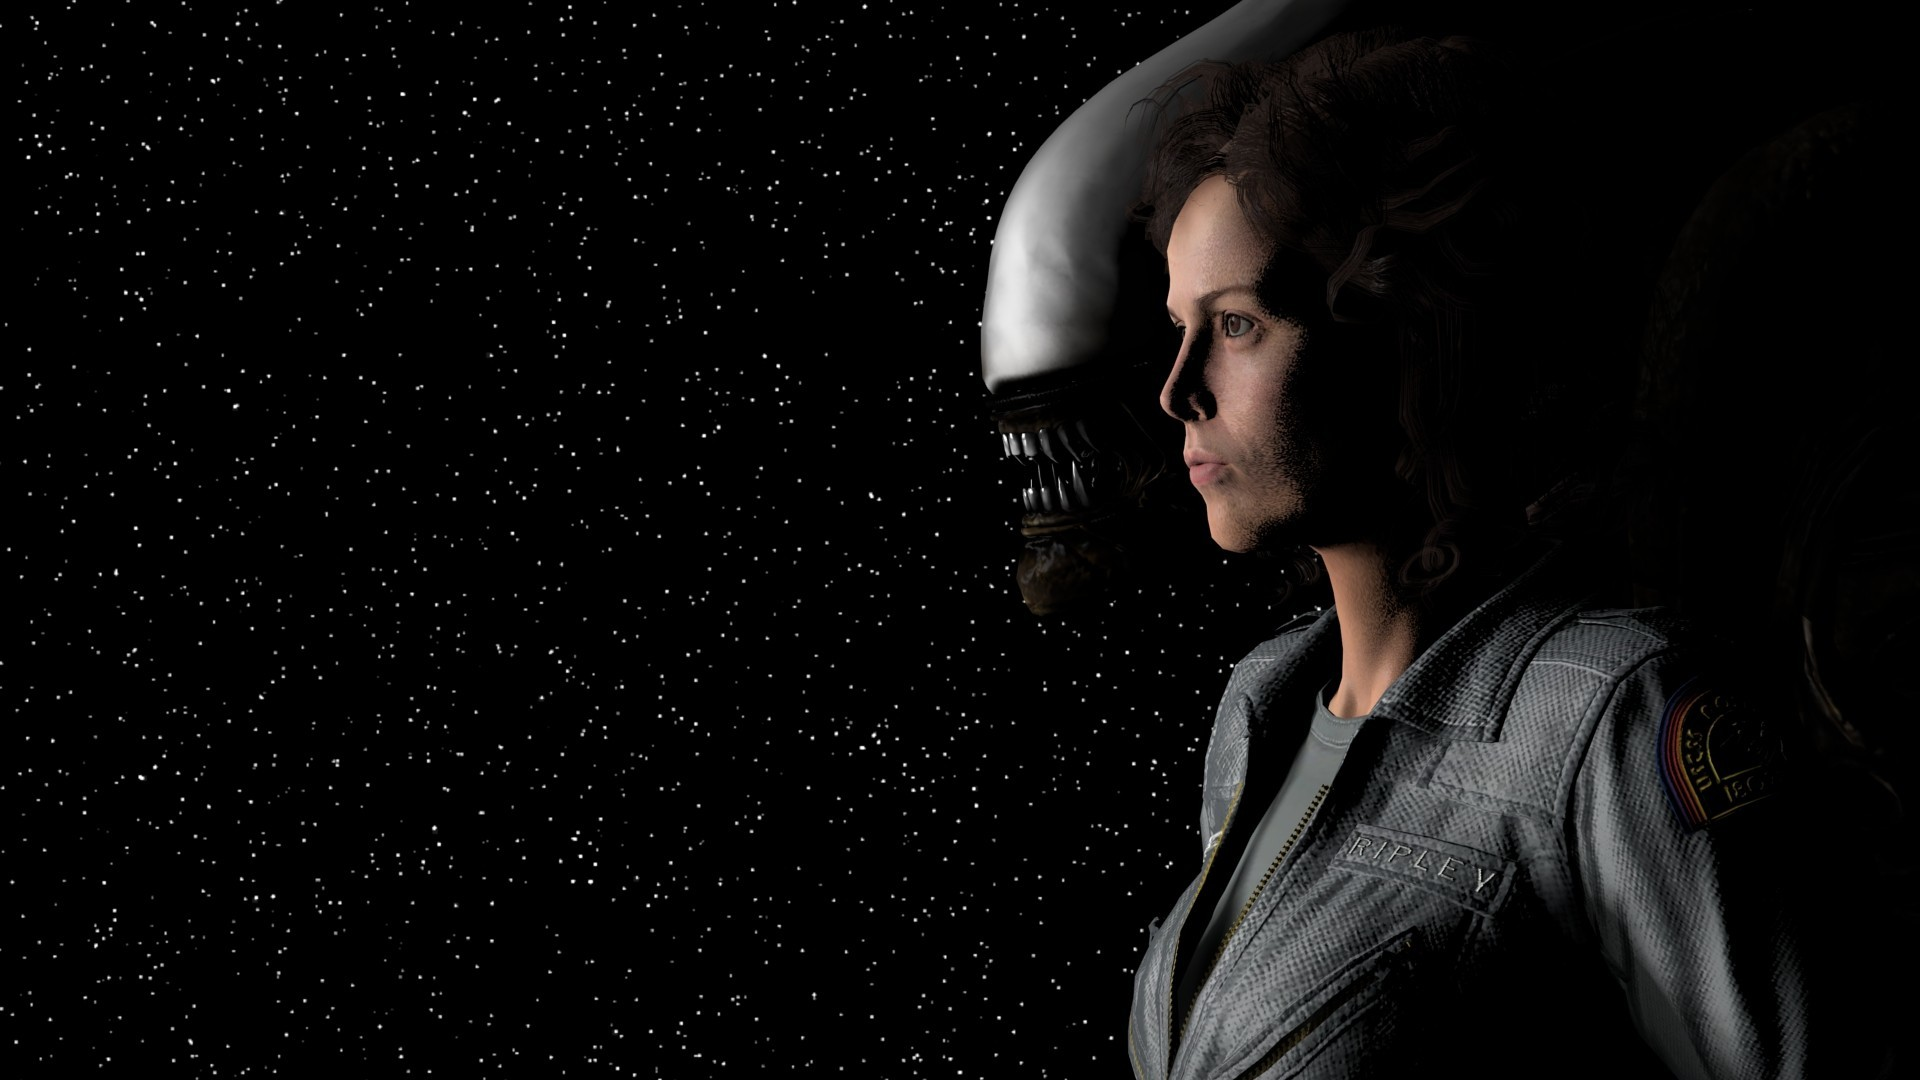 Res: 1920x1080, General  women actress movies space Alien (movie) Sigourney Weaver  Ellen Ripley astronaut stars